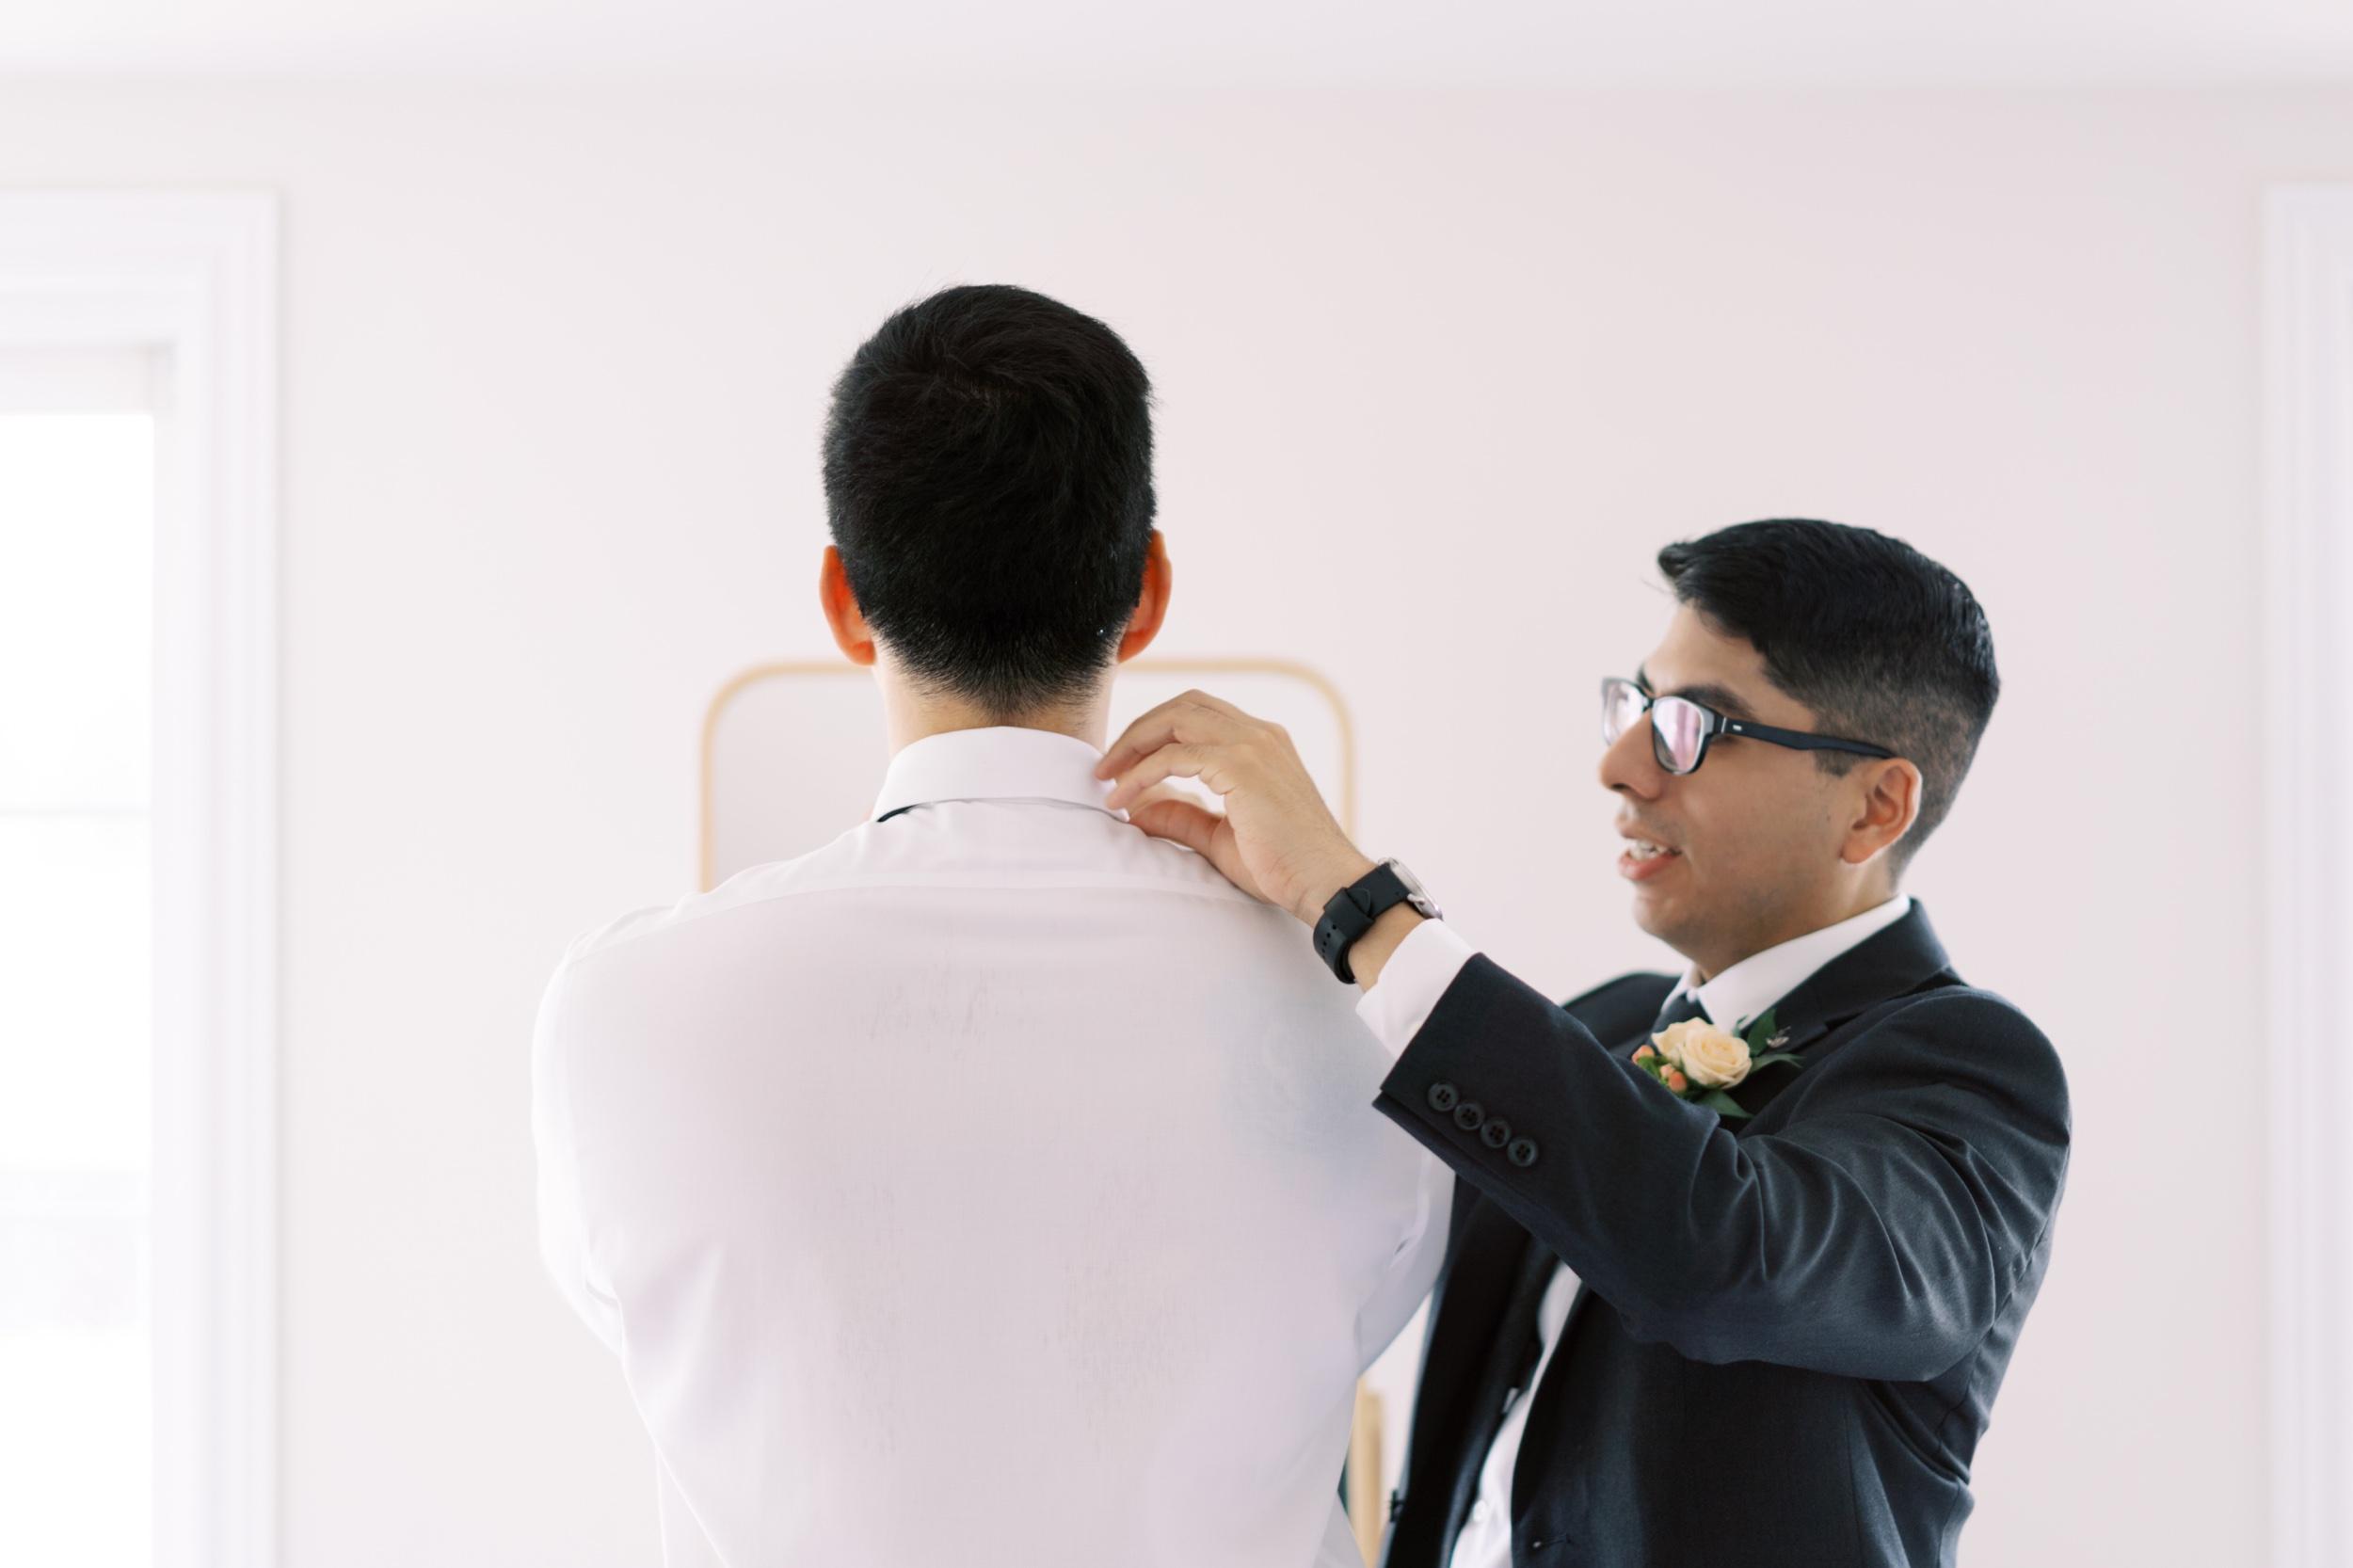 arlington estate wedding - groom getting ready-7.jpeg